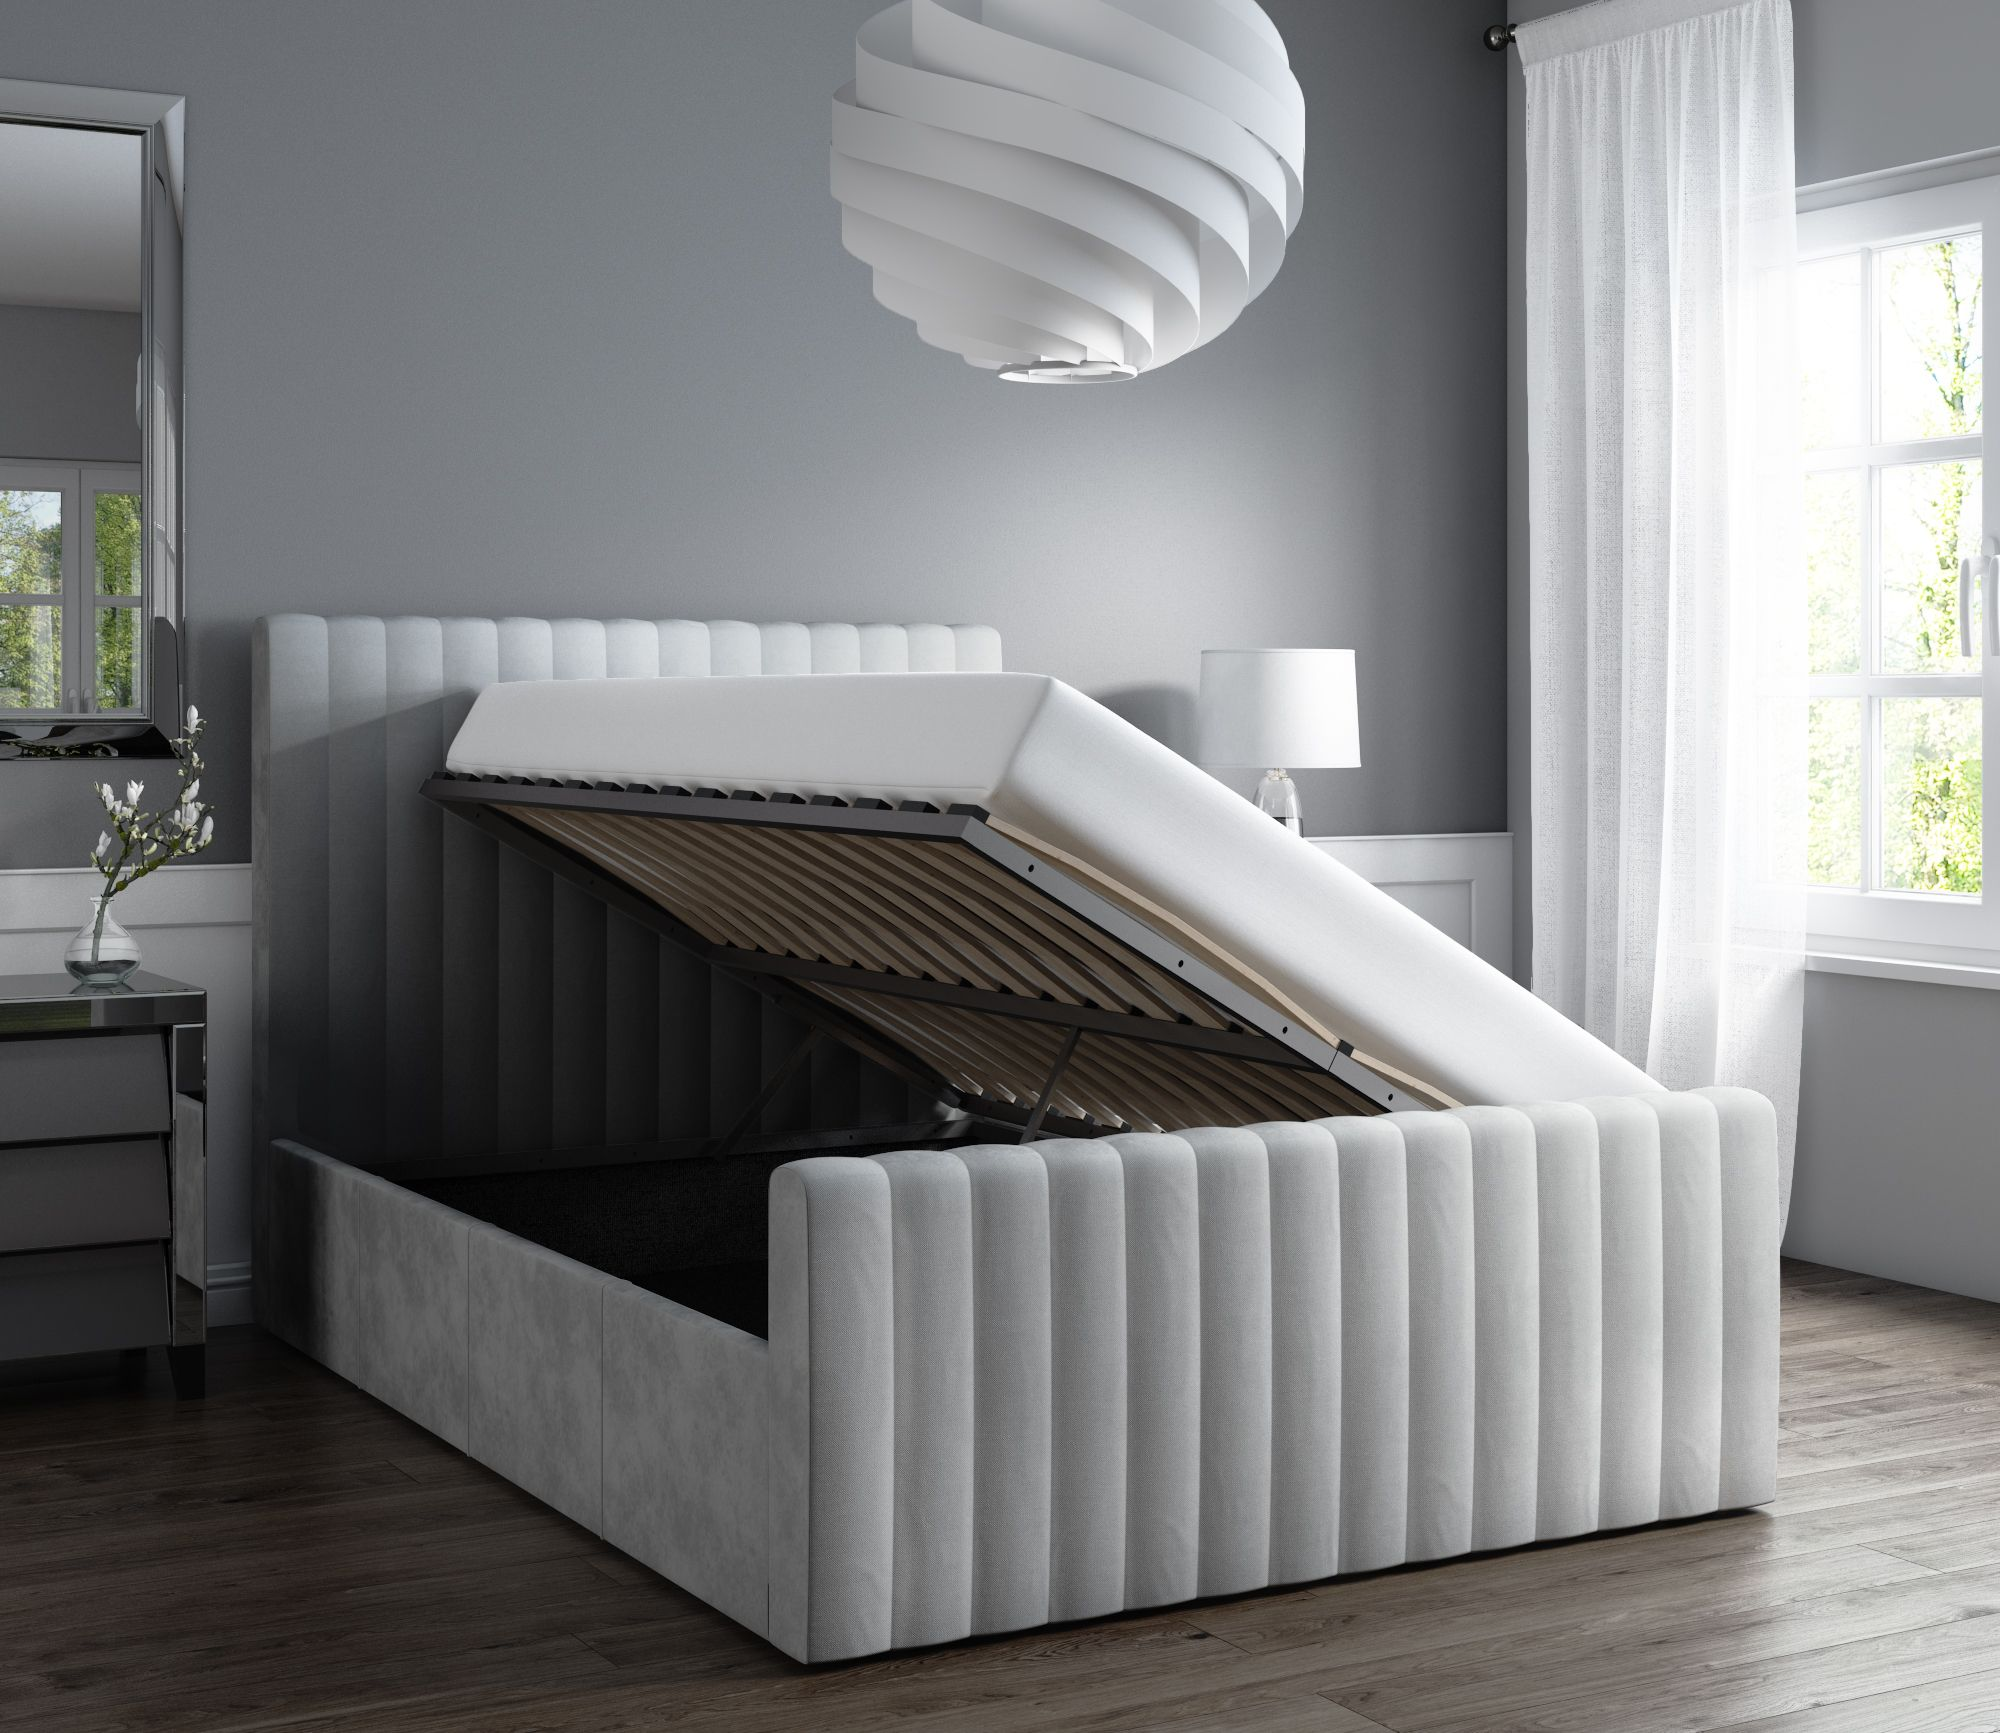 Awesome Khloe Double Side Ottoman Bed In Silver Grey Velvet Khl002 Creativecarmelina Interior Chair Design Creativecarmelinacom